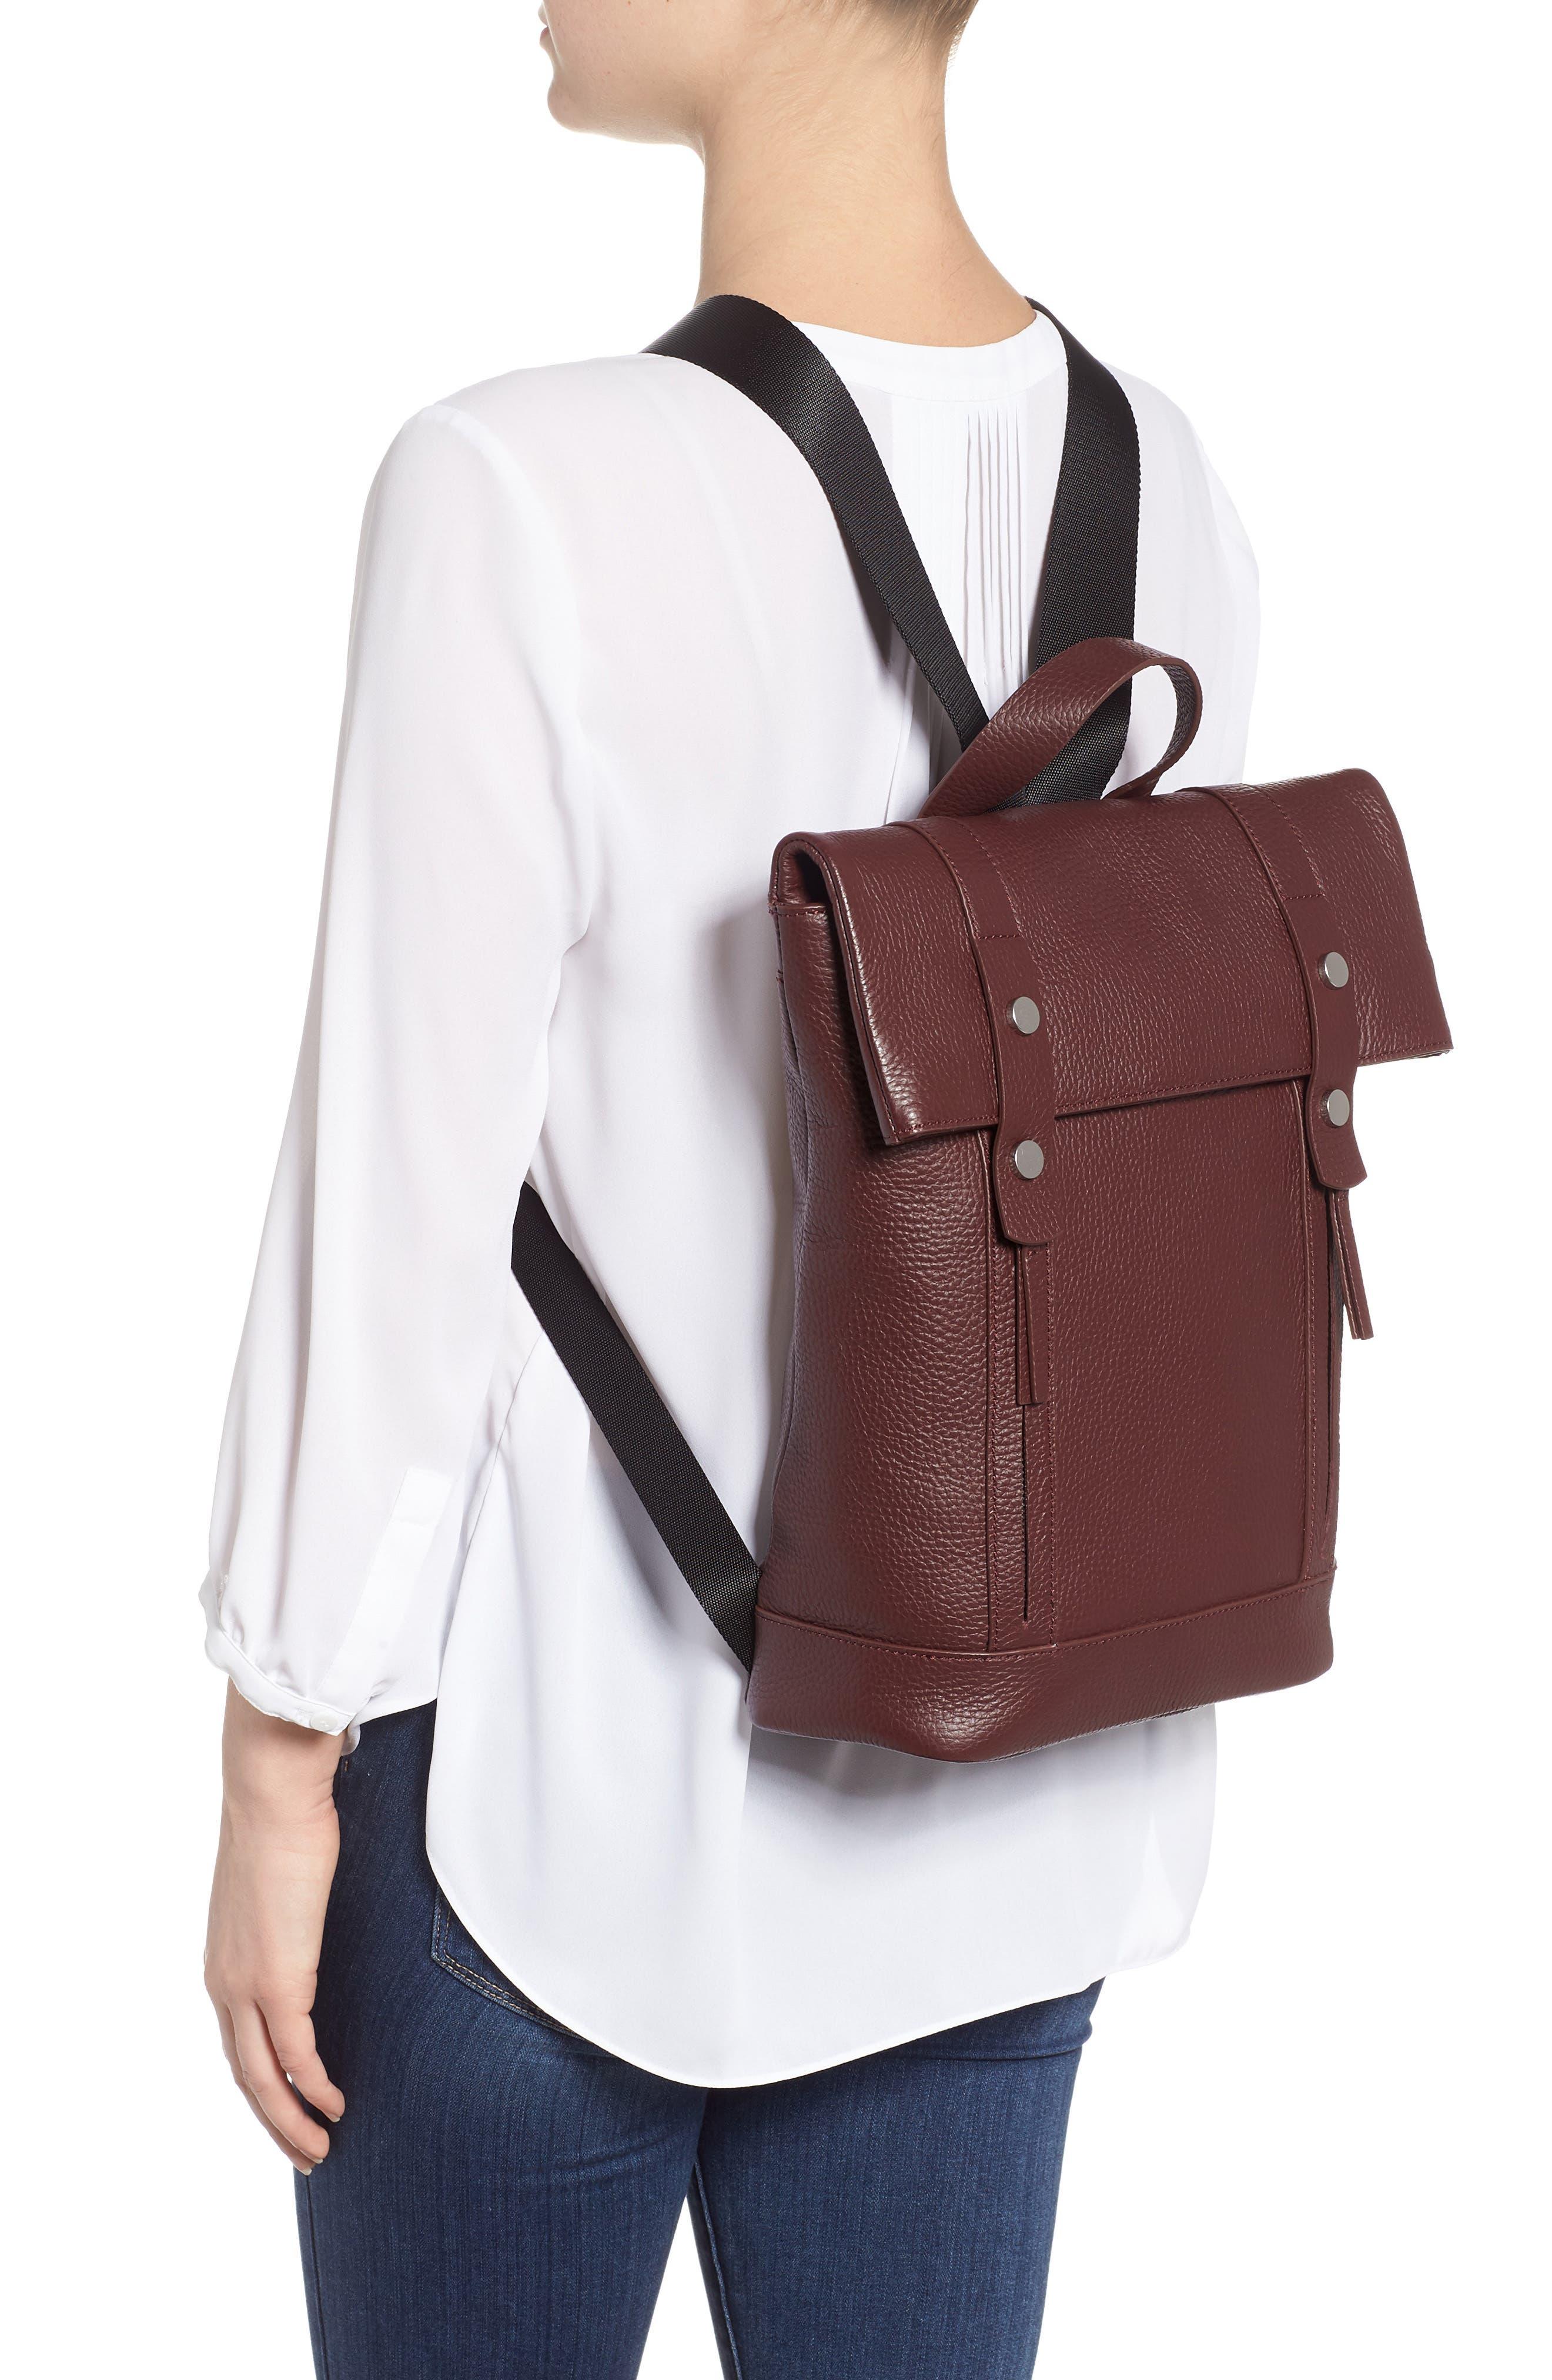 Remy Pebbled Leather Backpack,                             Alternate thumbnail 2, color,                             BURGUNDY FIG